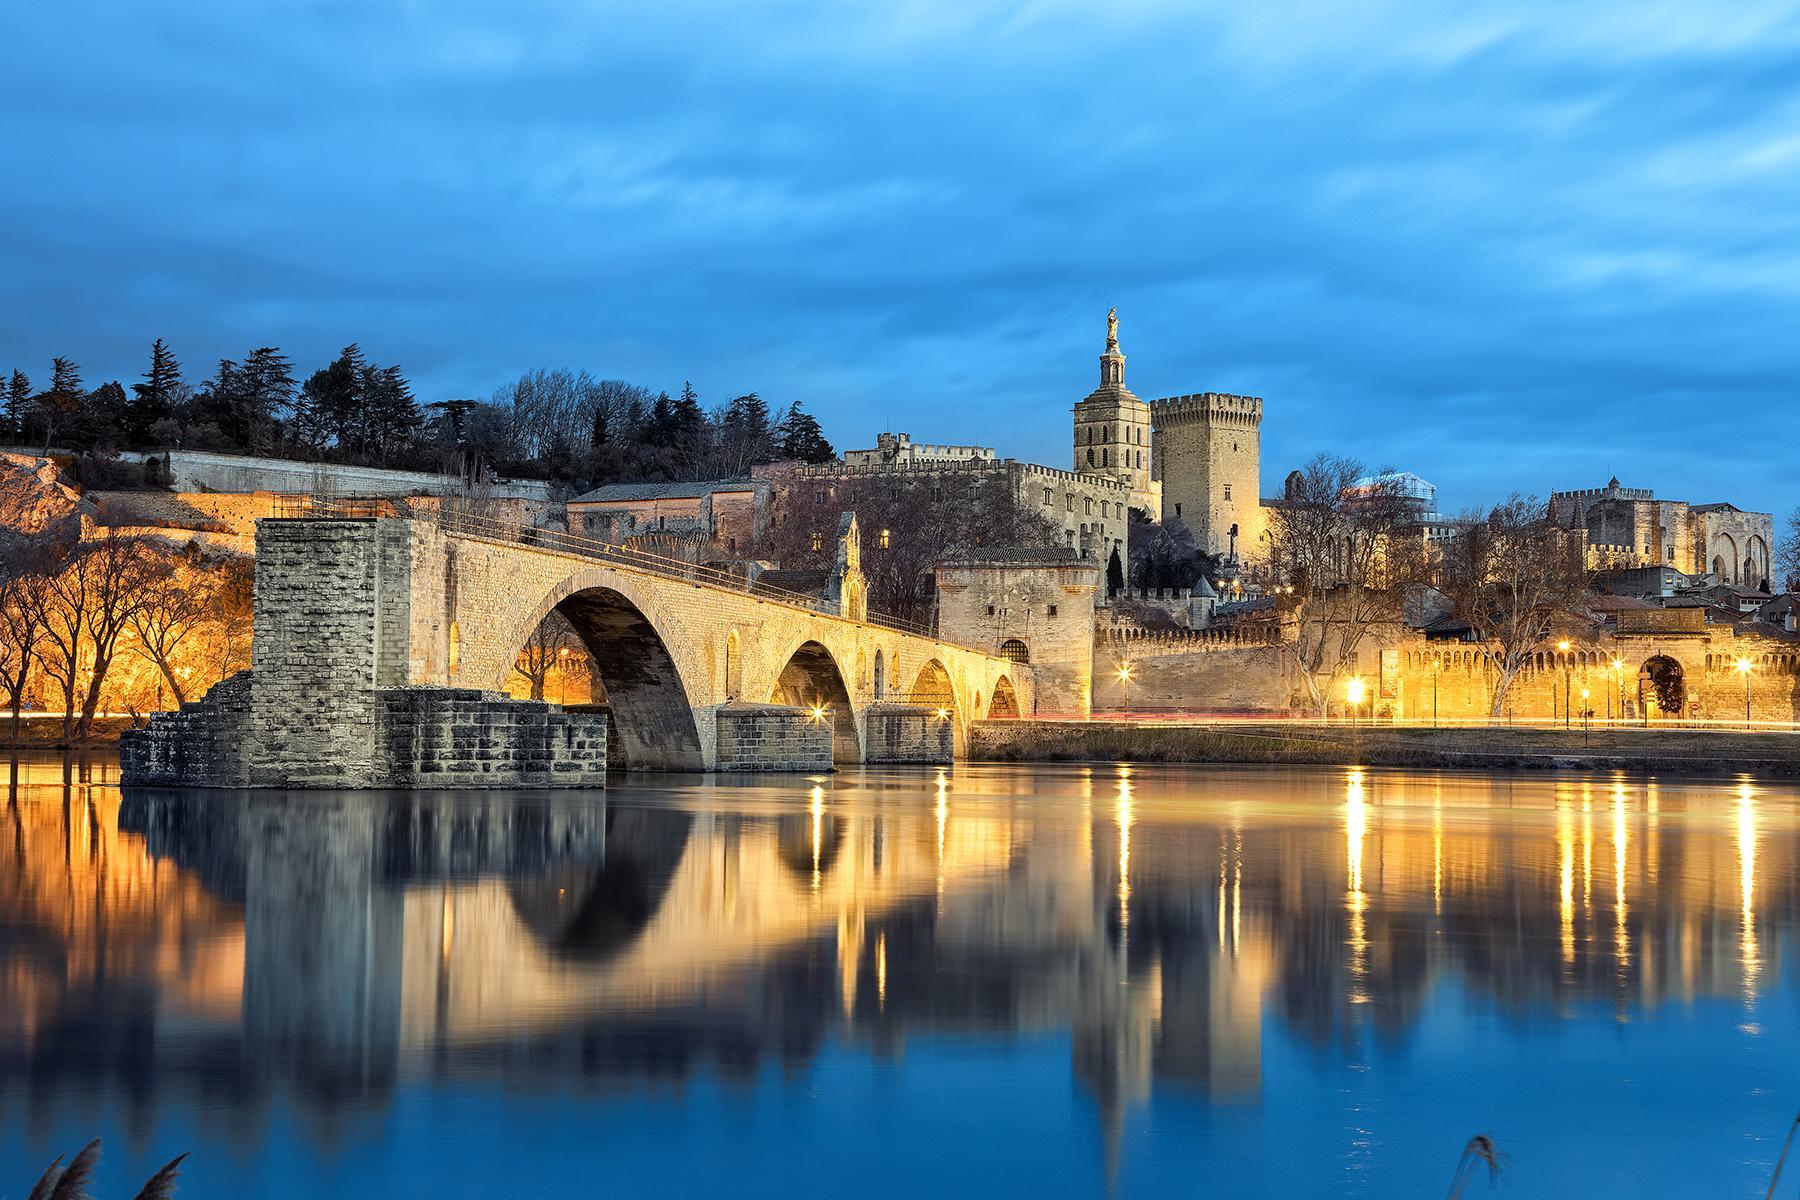 02_PicturePerfectProvenceTowns__Avignon_shutterstock_1013445280